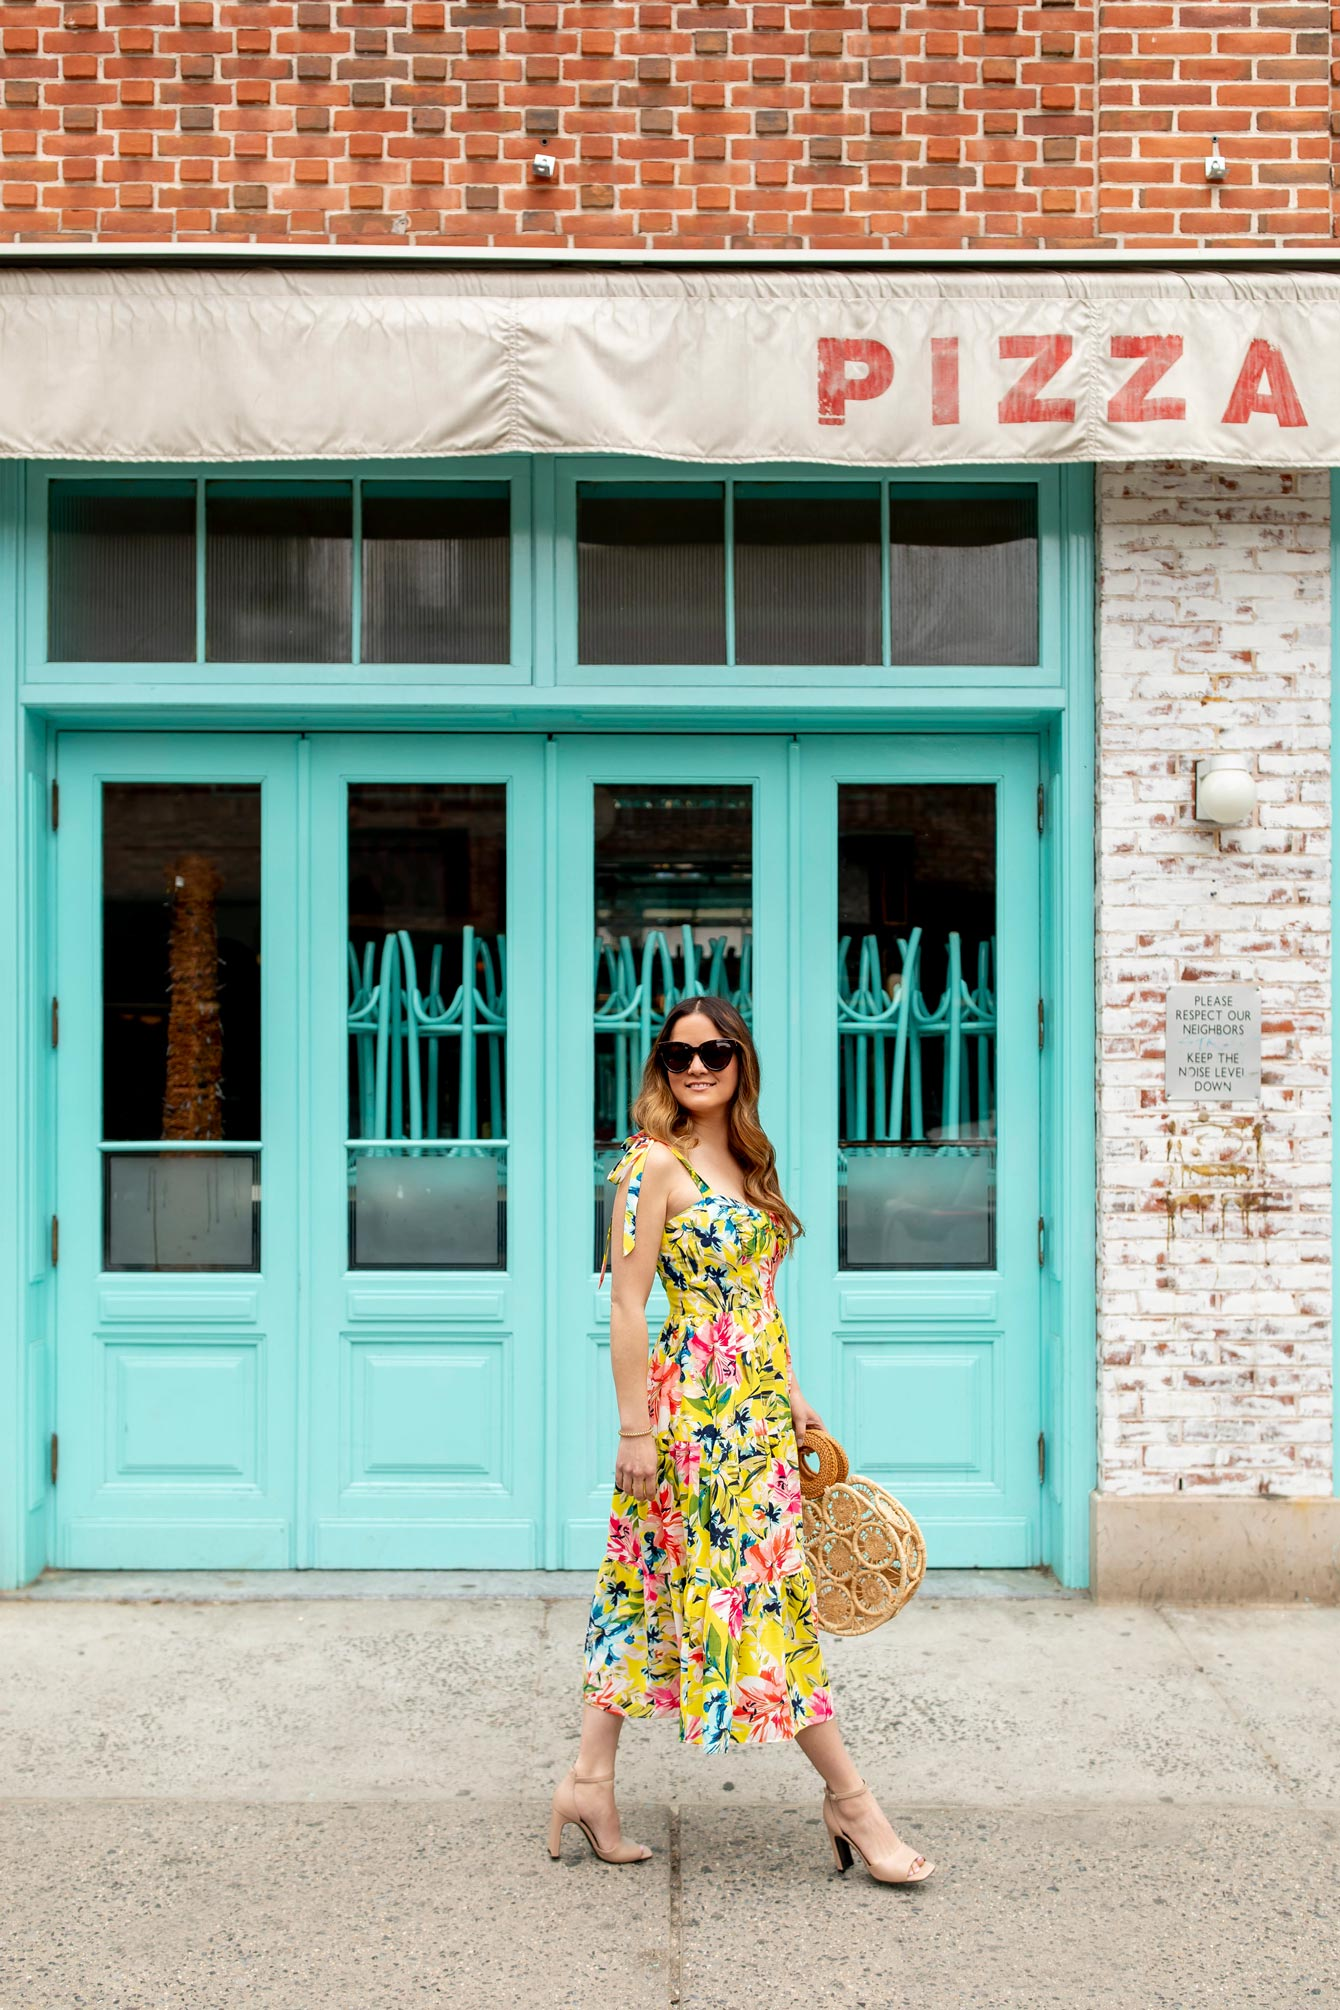 Colorful Doors New York City